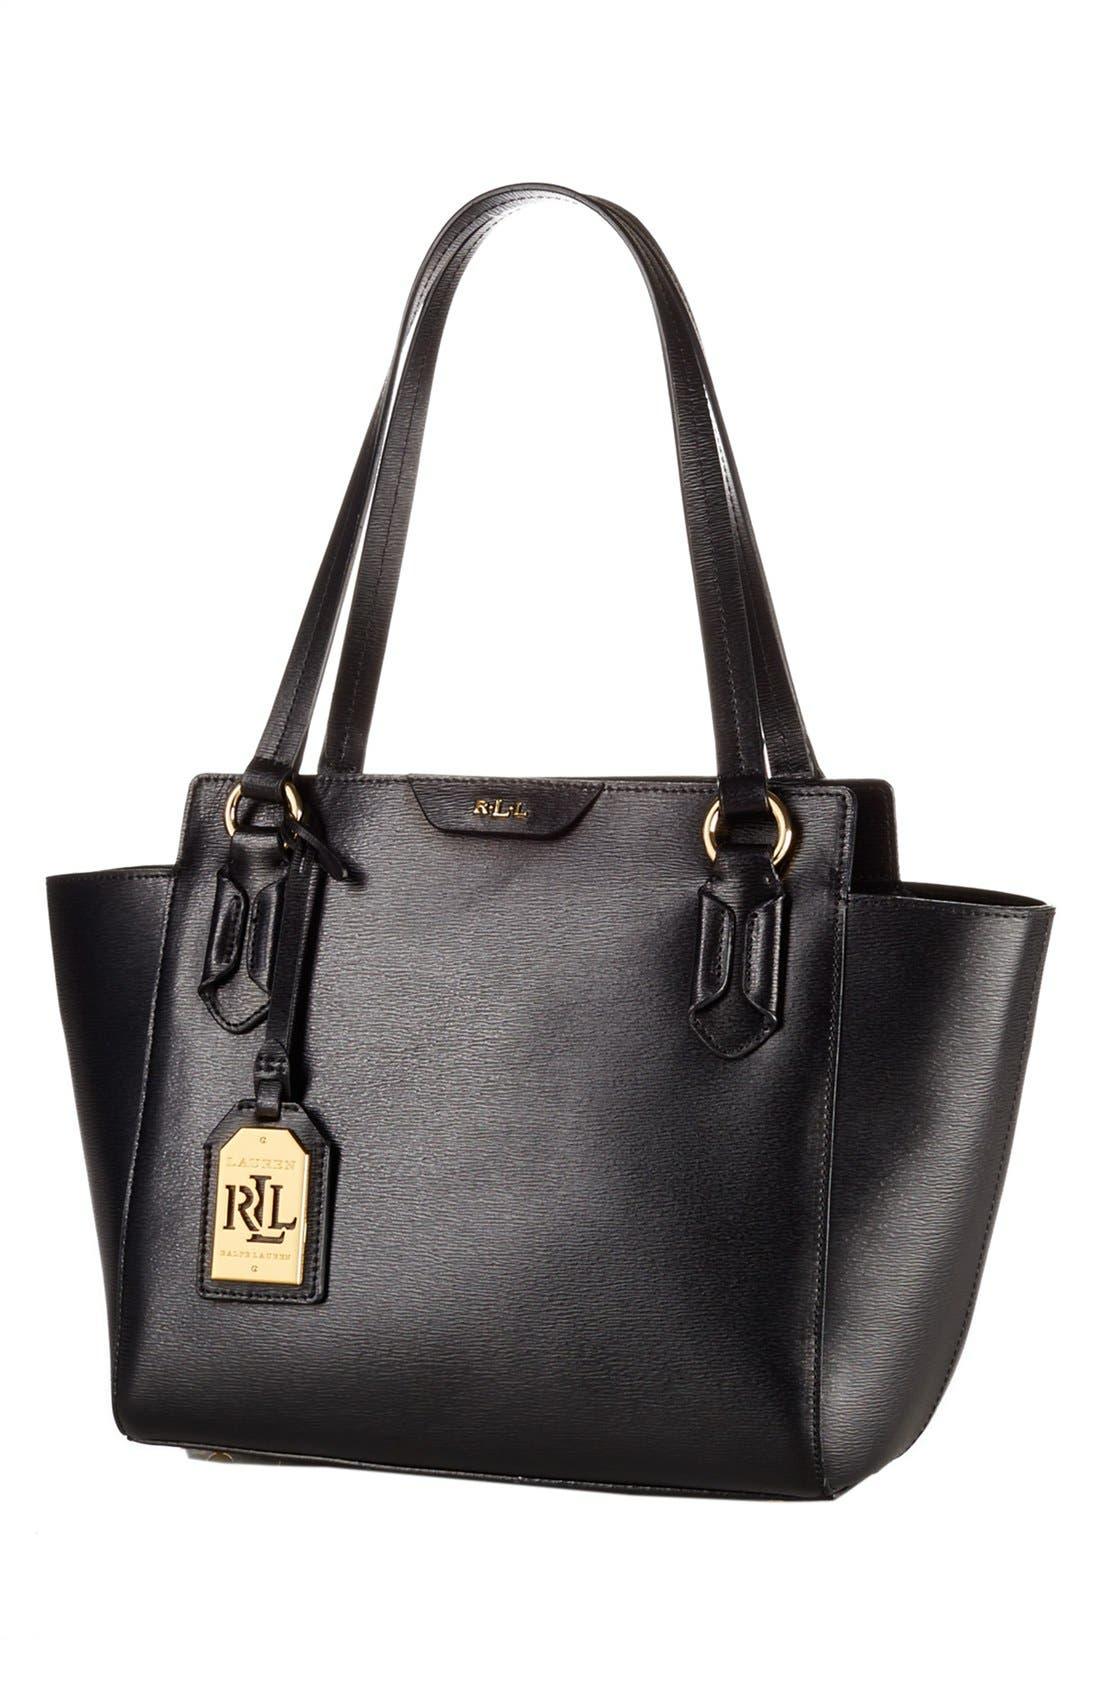 Alternate Image 1 Selected - Lauren Ralph Lauren 'Tate' Leather Shopper